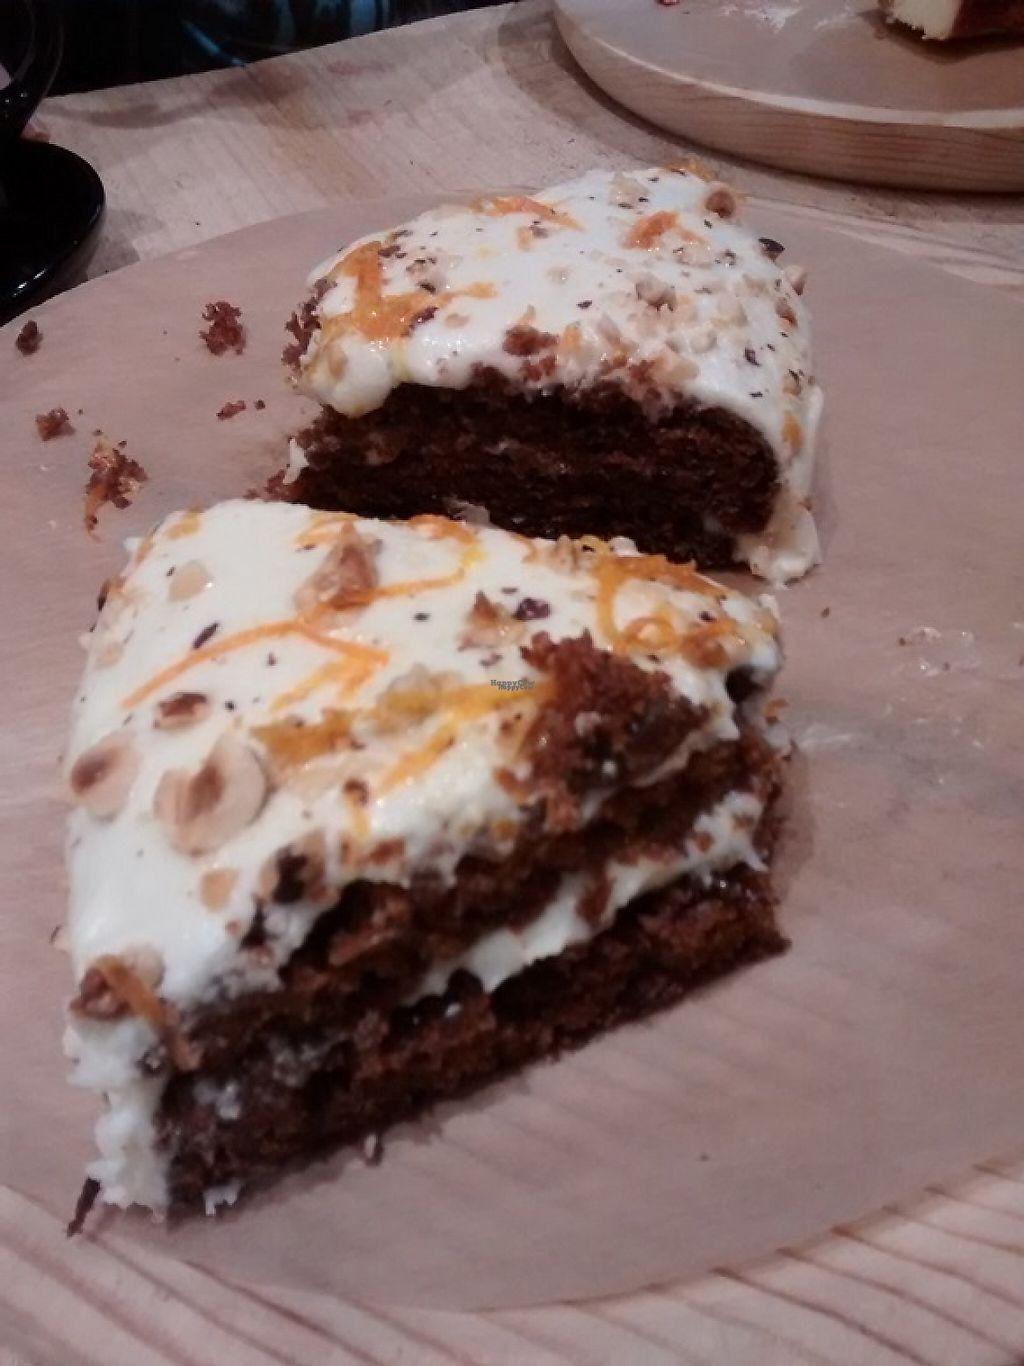 "Photo of La Huerta de Almeria - Calle de San Millan  by <a href=""/members/profile/LeFunks"">LeFunks</a> <br/>Carrot cake <br/> January 12, 2017  - <a href='/contact/abuse/image/80682/211368'>Report</a>"